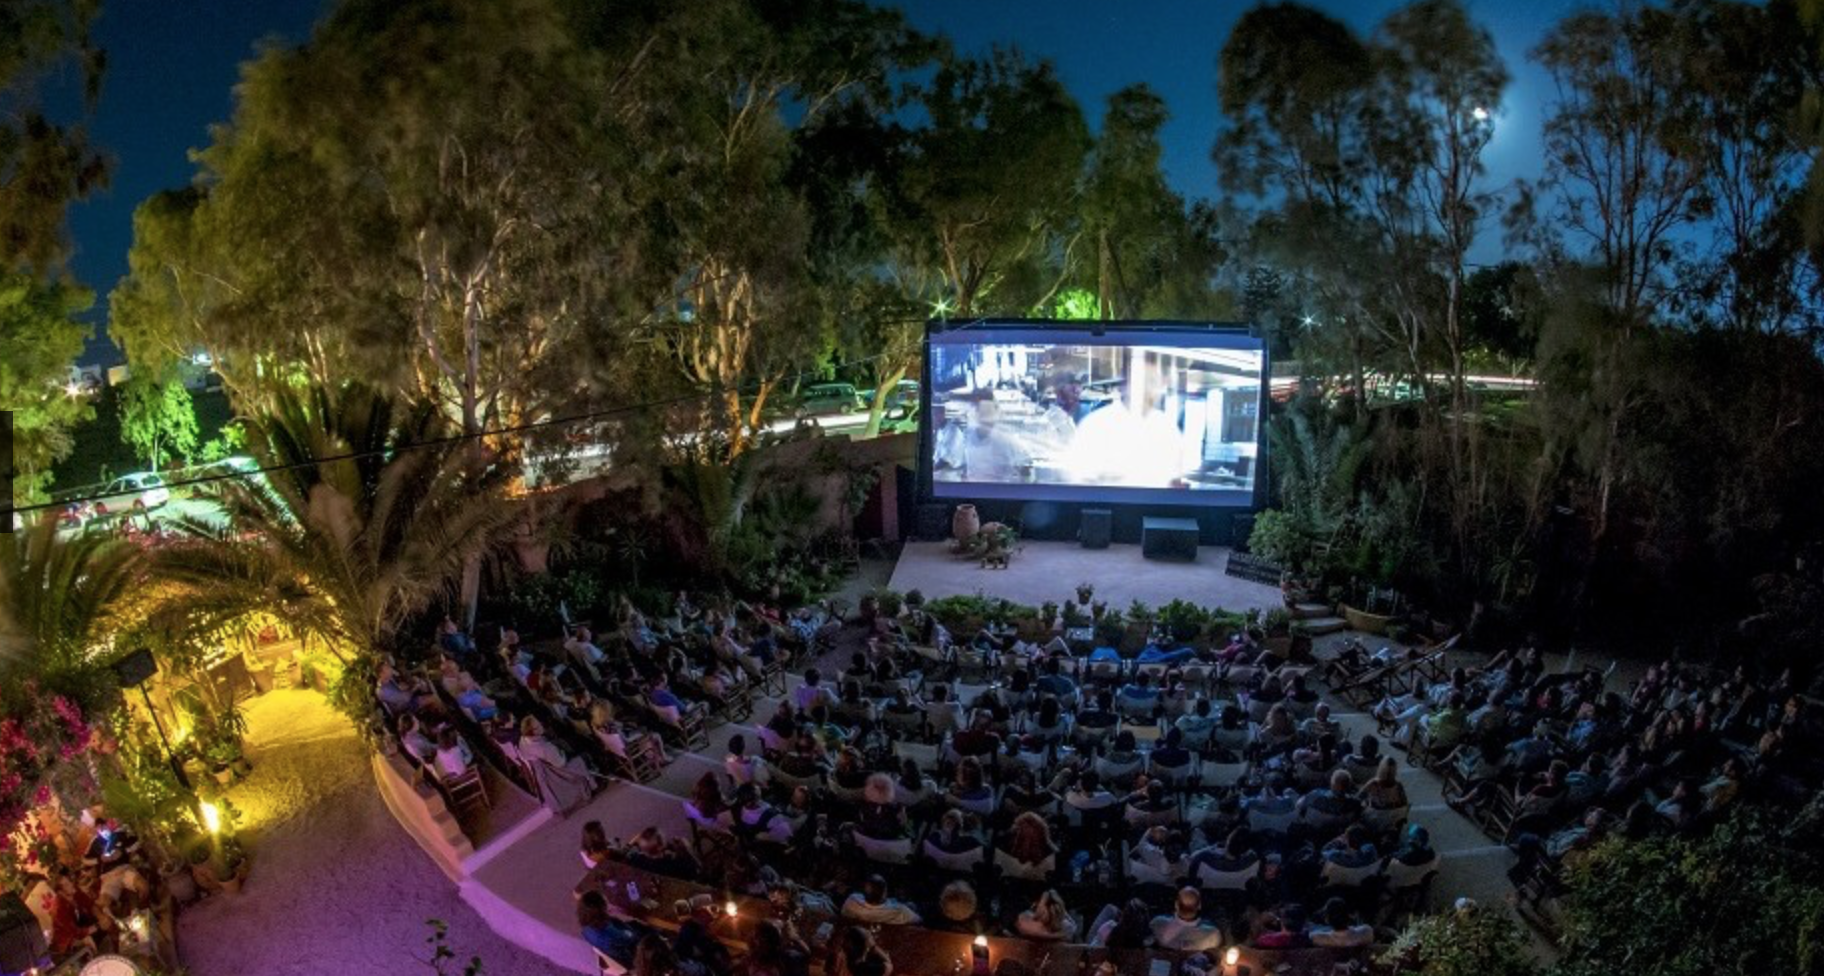 Santorini's Open Air Cinema